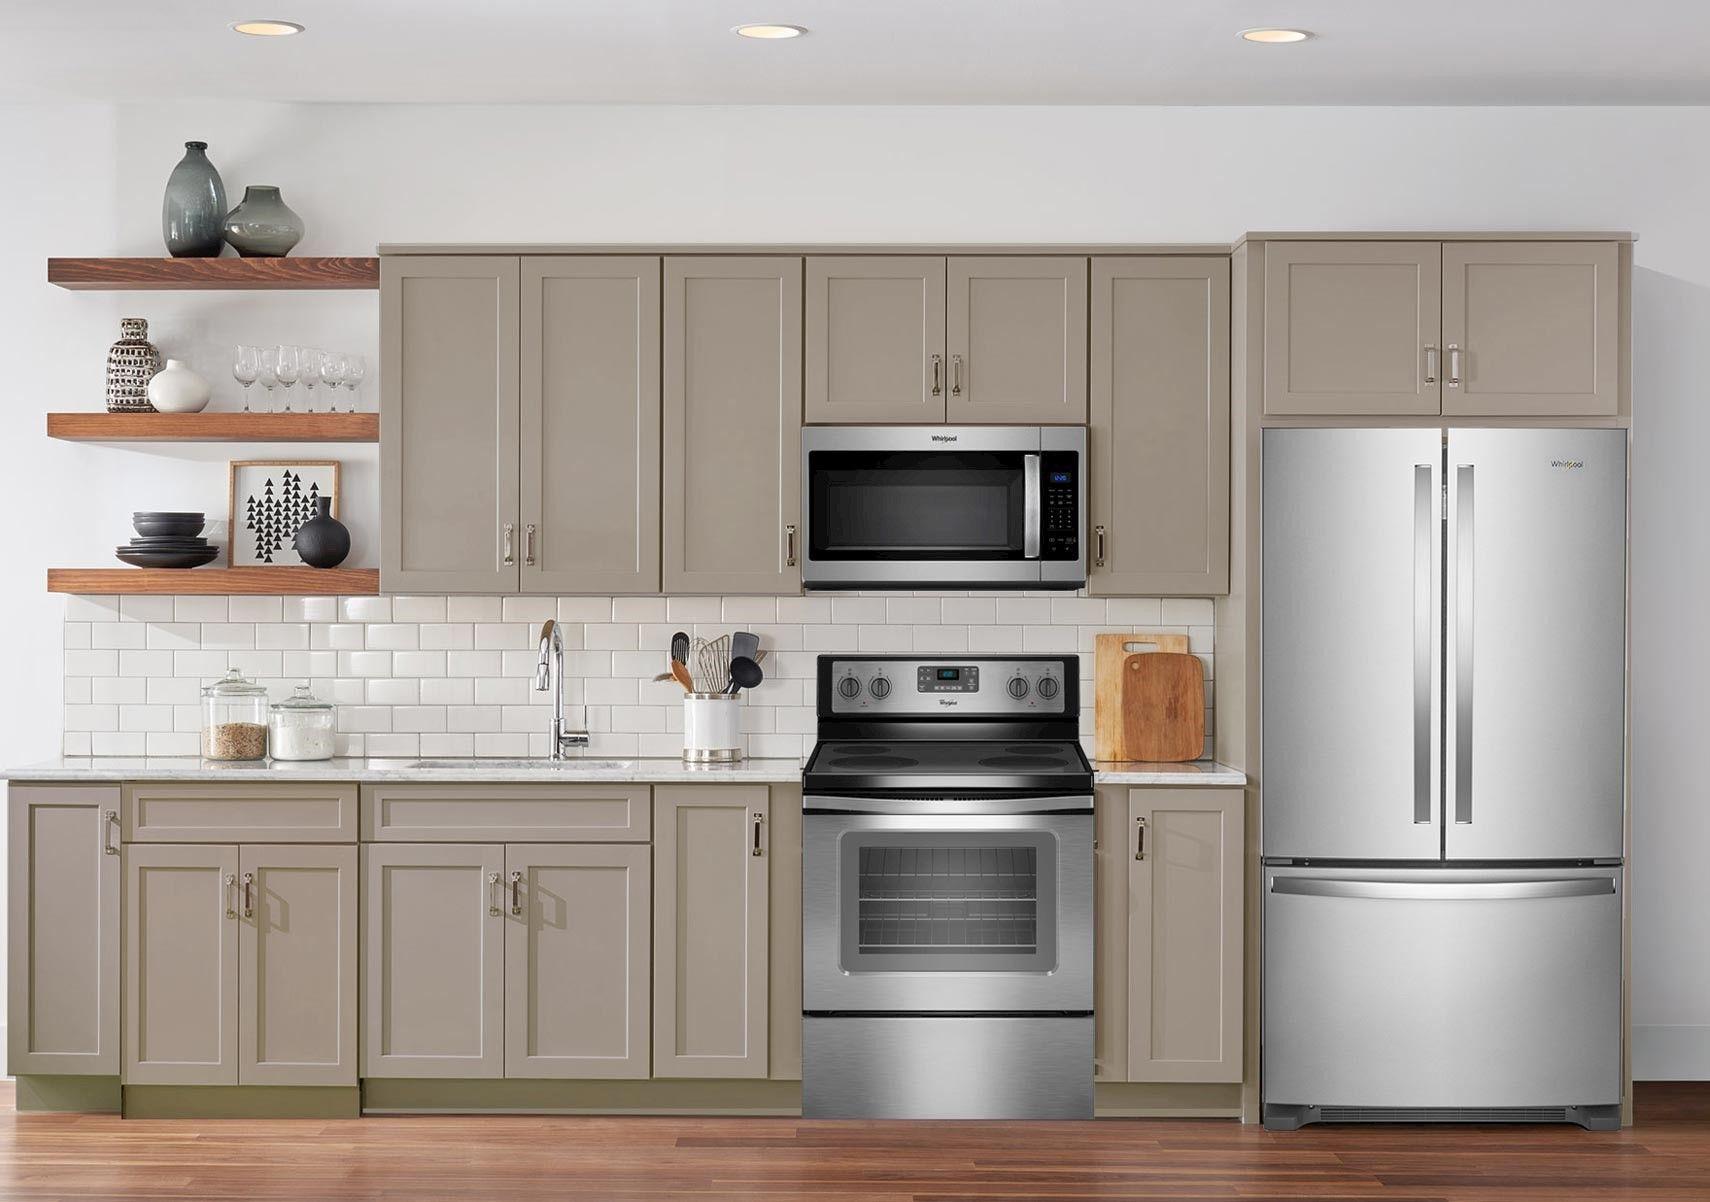 lacks whirlpool 3 pc stainless steel kitchen appliance package stainless steel kitchen on kitchen appliances id=86008